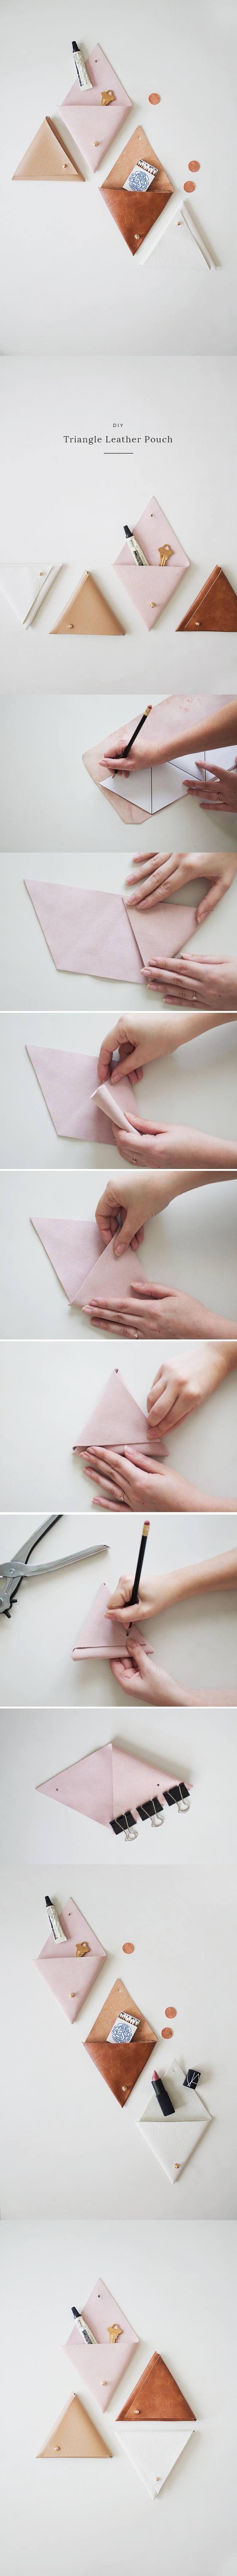 utilizar patrón para técnica patchwork